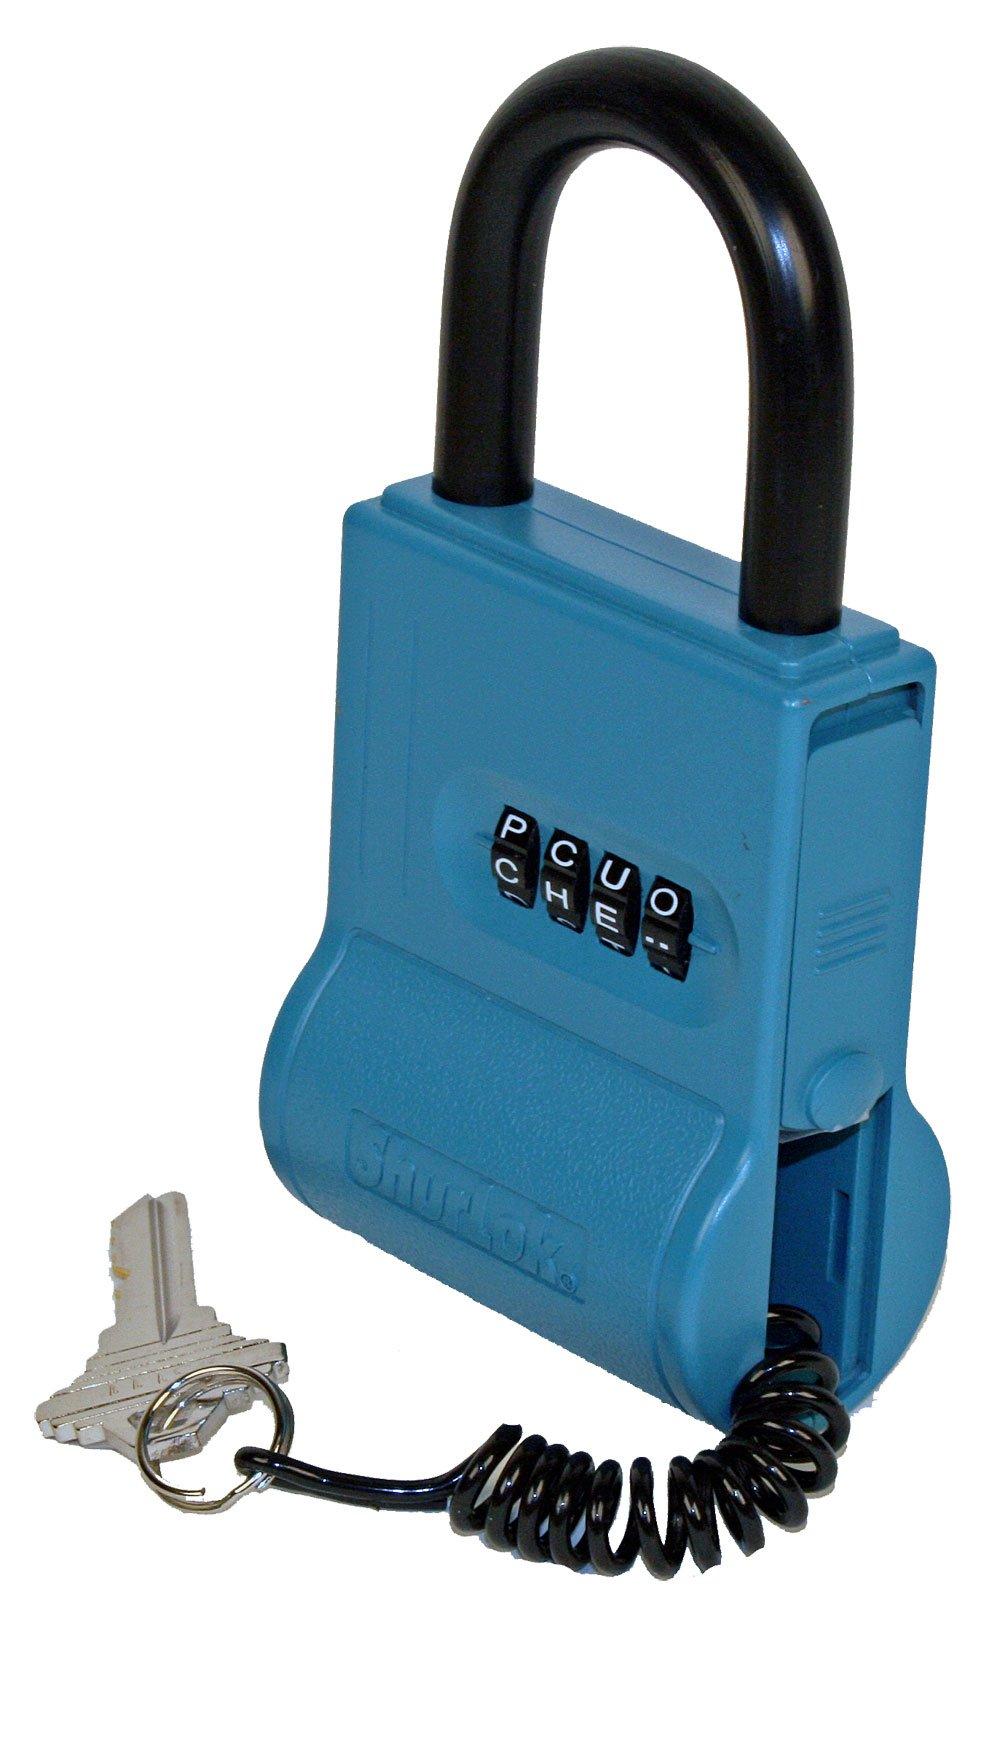 ShurLok SL-100-NDE-C 4 Dial Lettered Key Storage Combination Lock Box, Blue